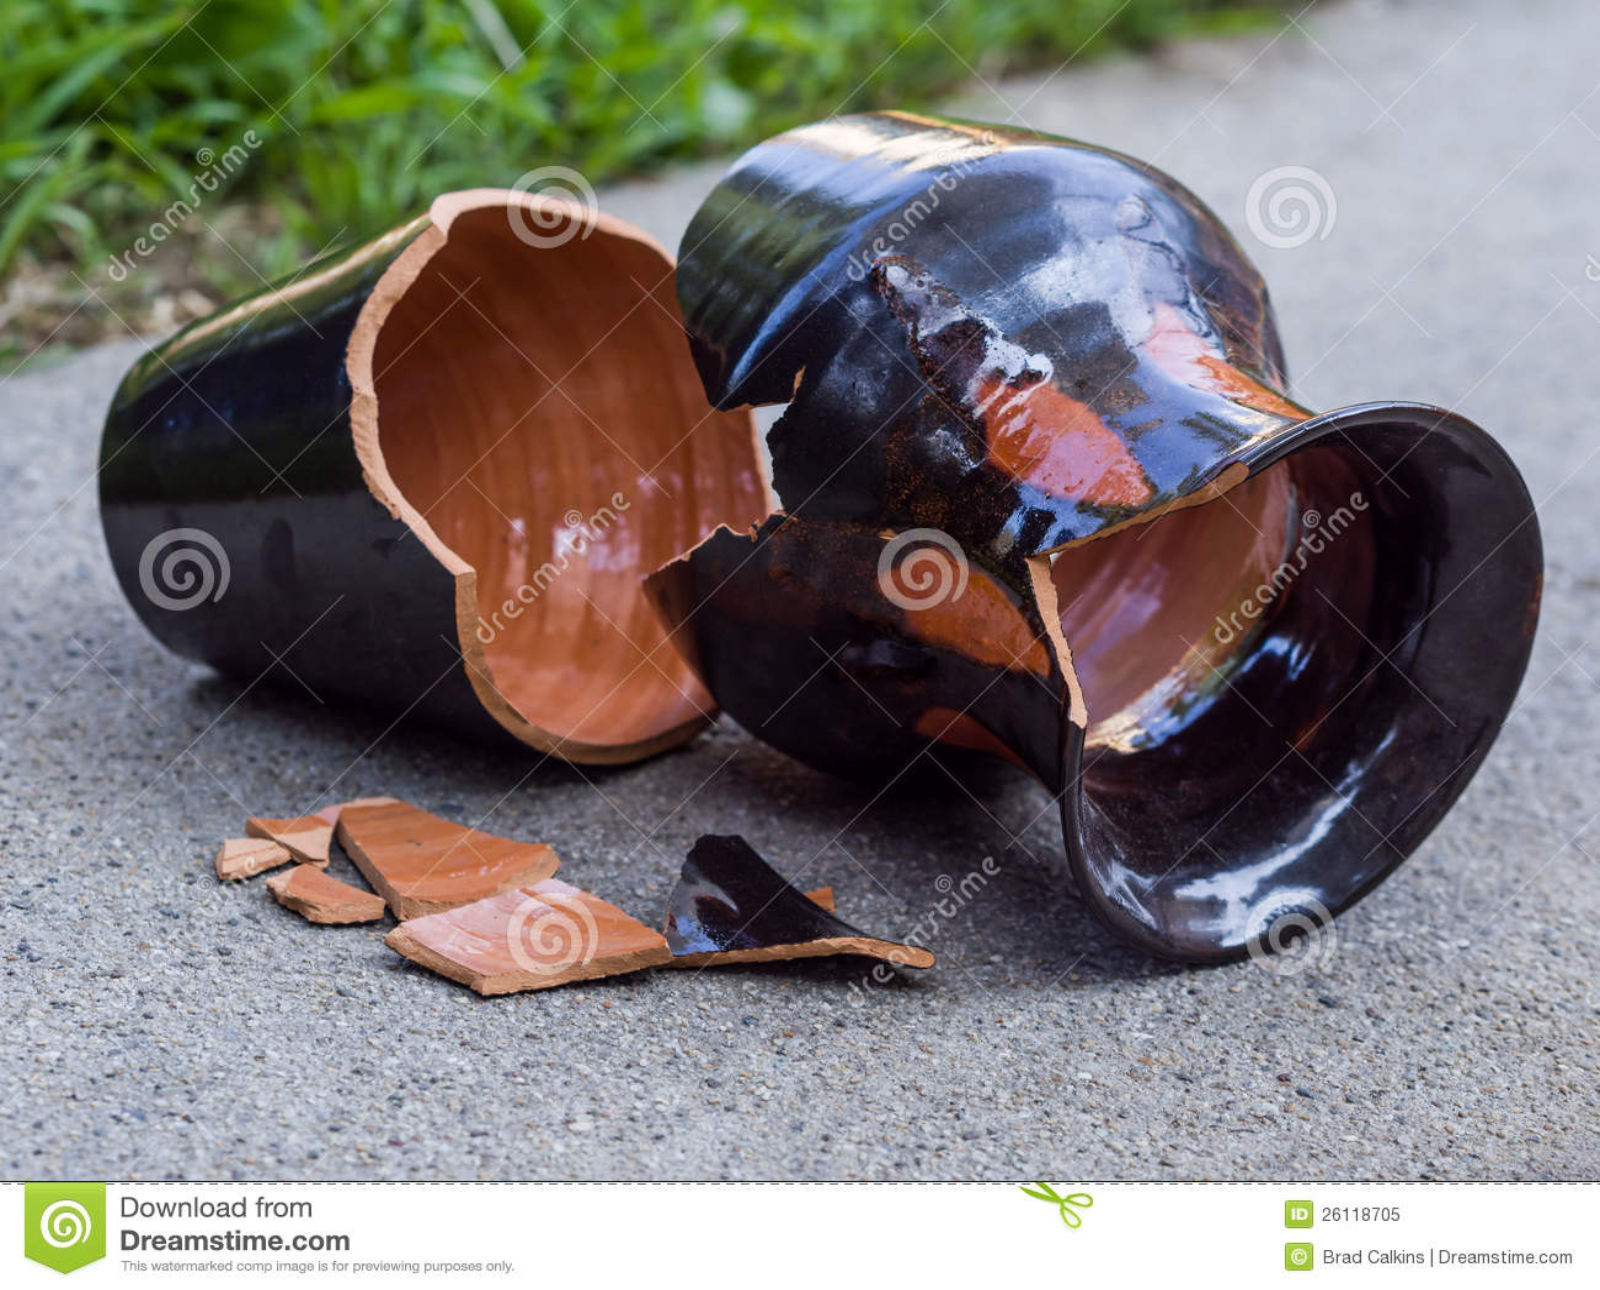 Broken Vase Royalty Free Stock Photo Image 26118705